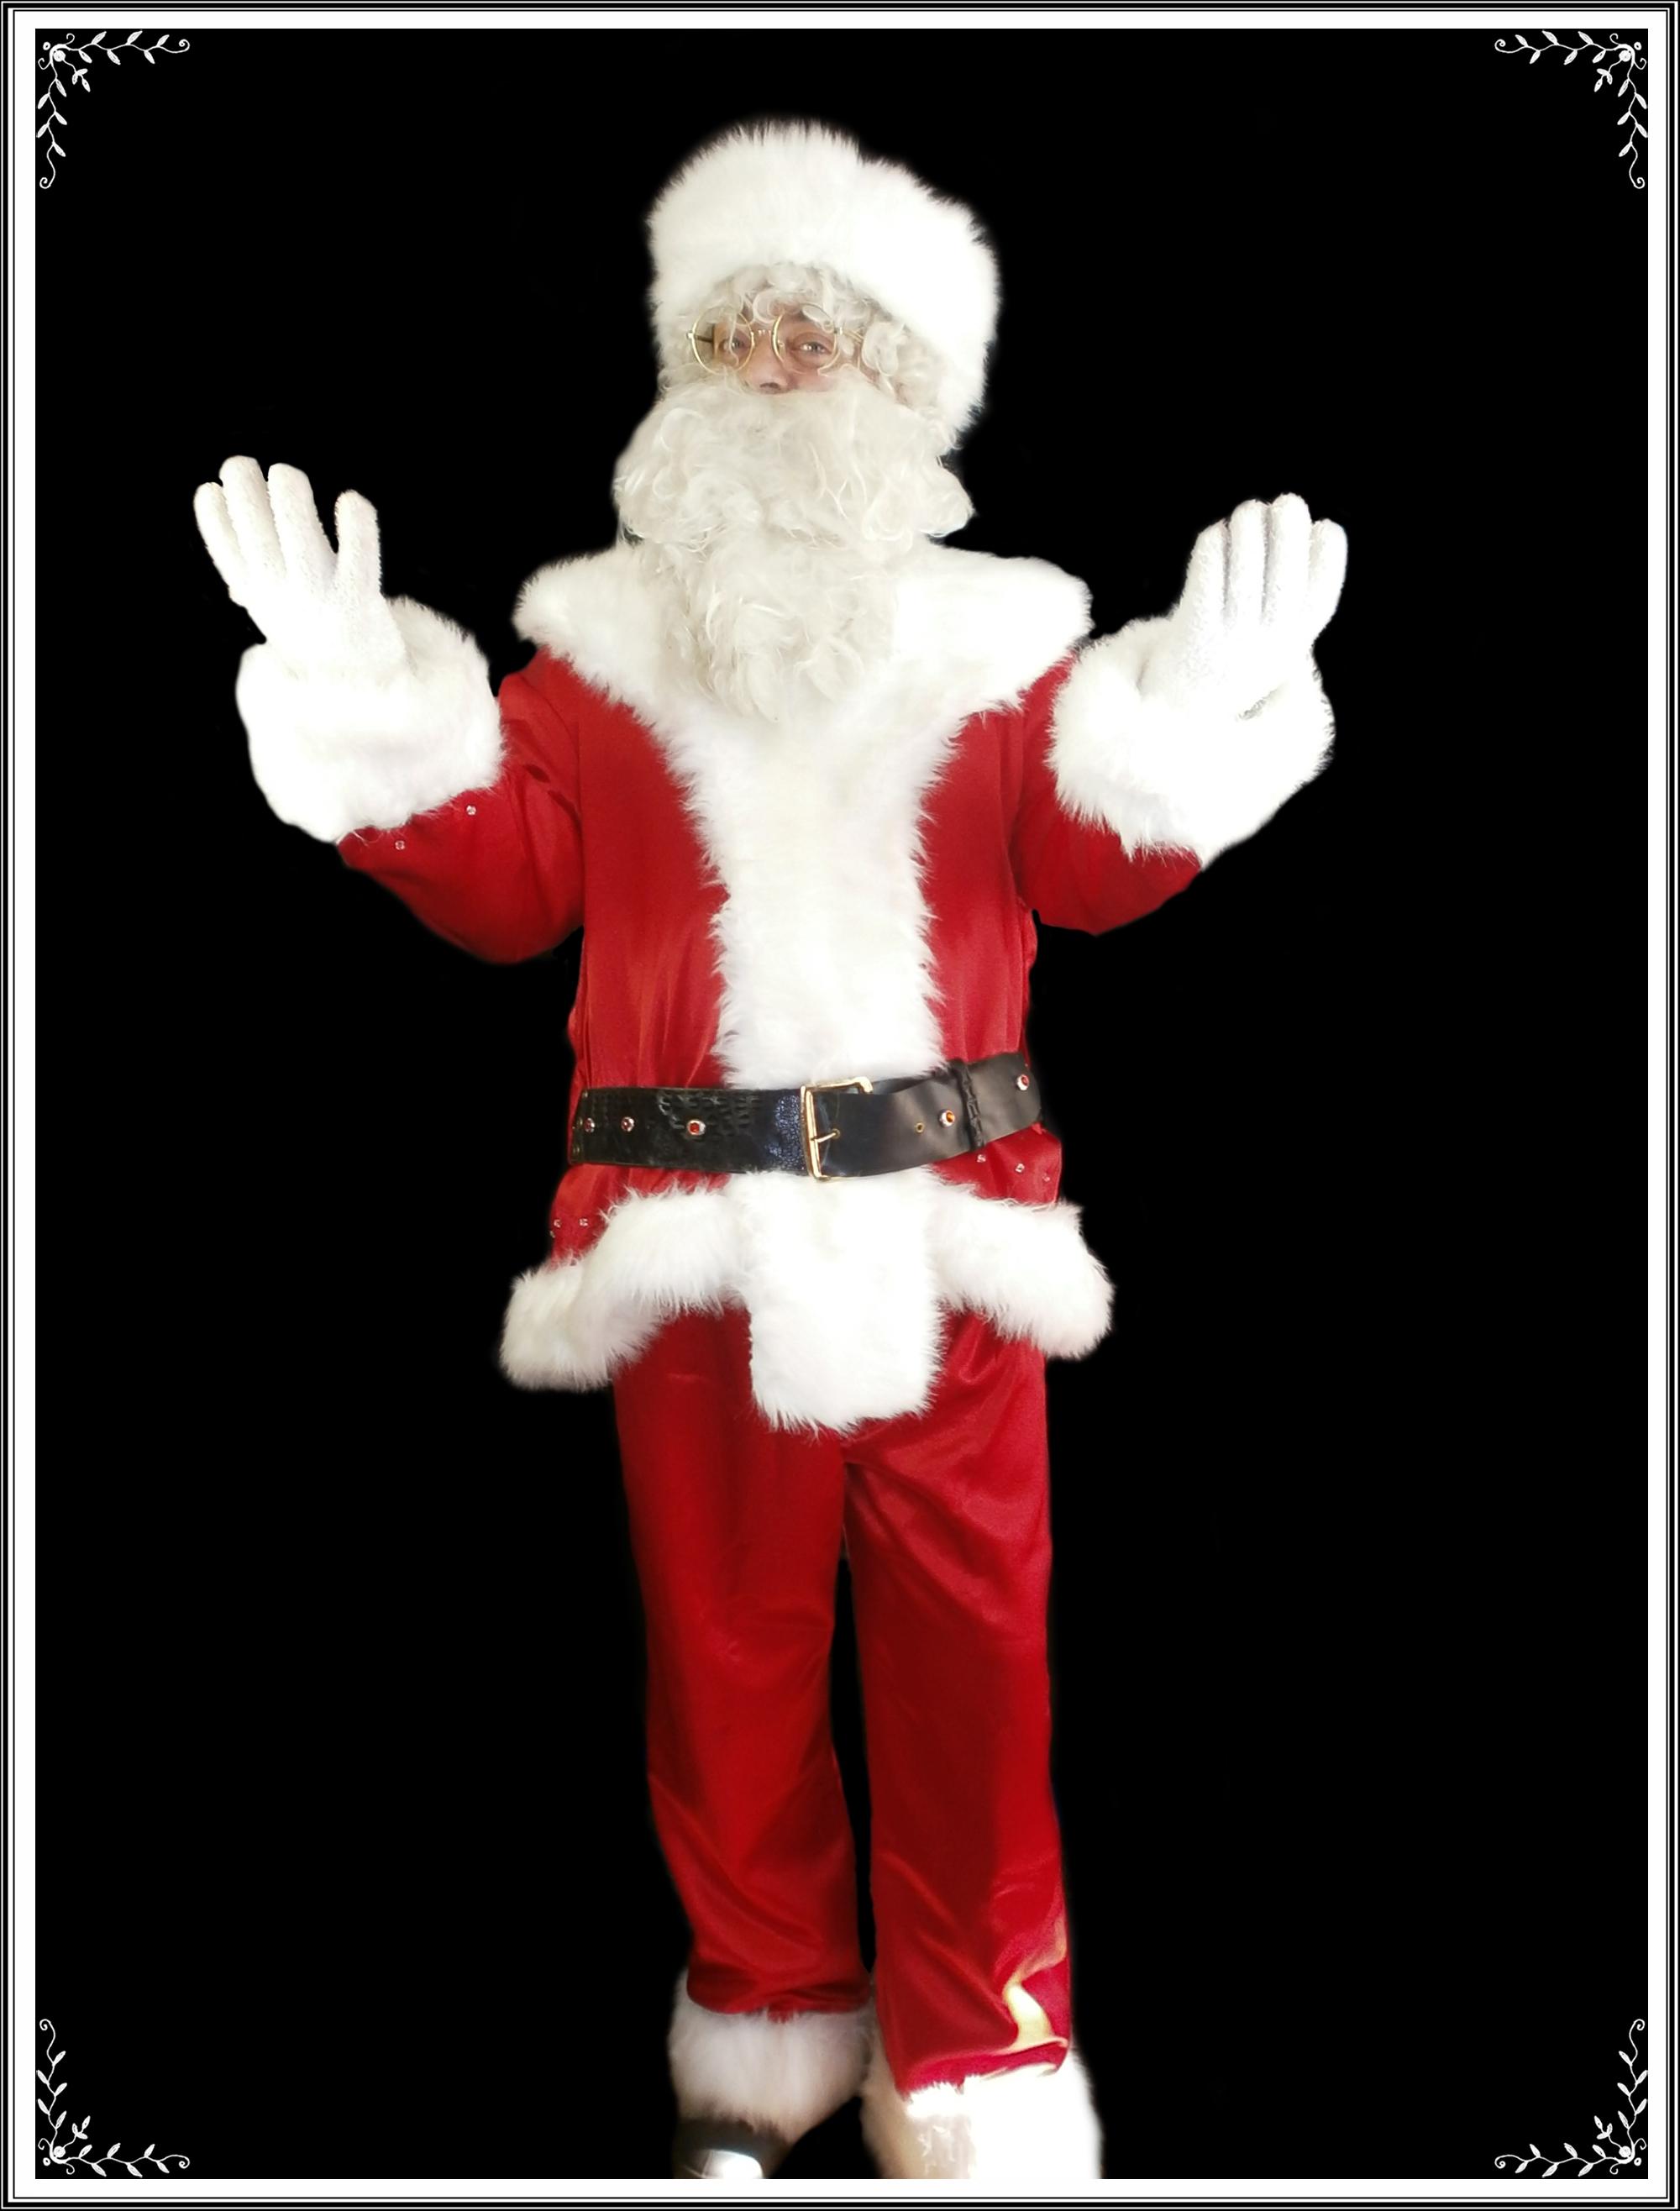 santa claus 0888 420 156 bulgarian phone number - White Santa Claus